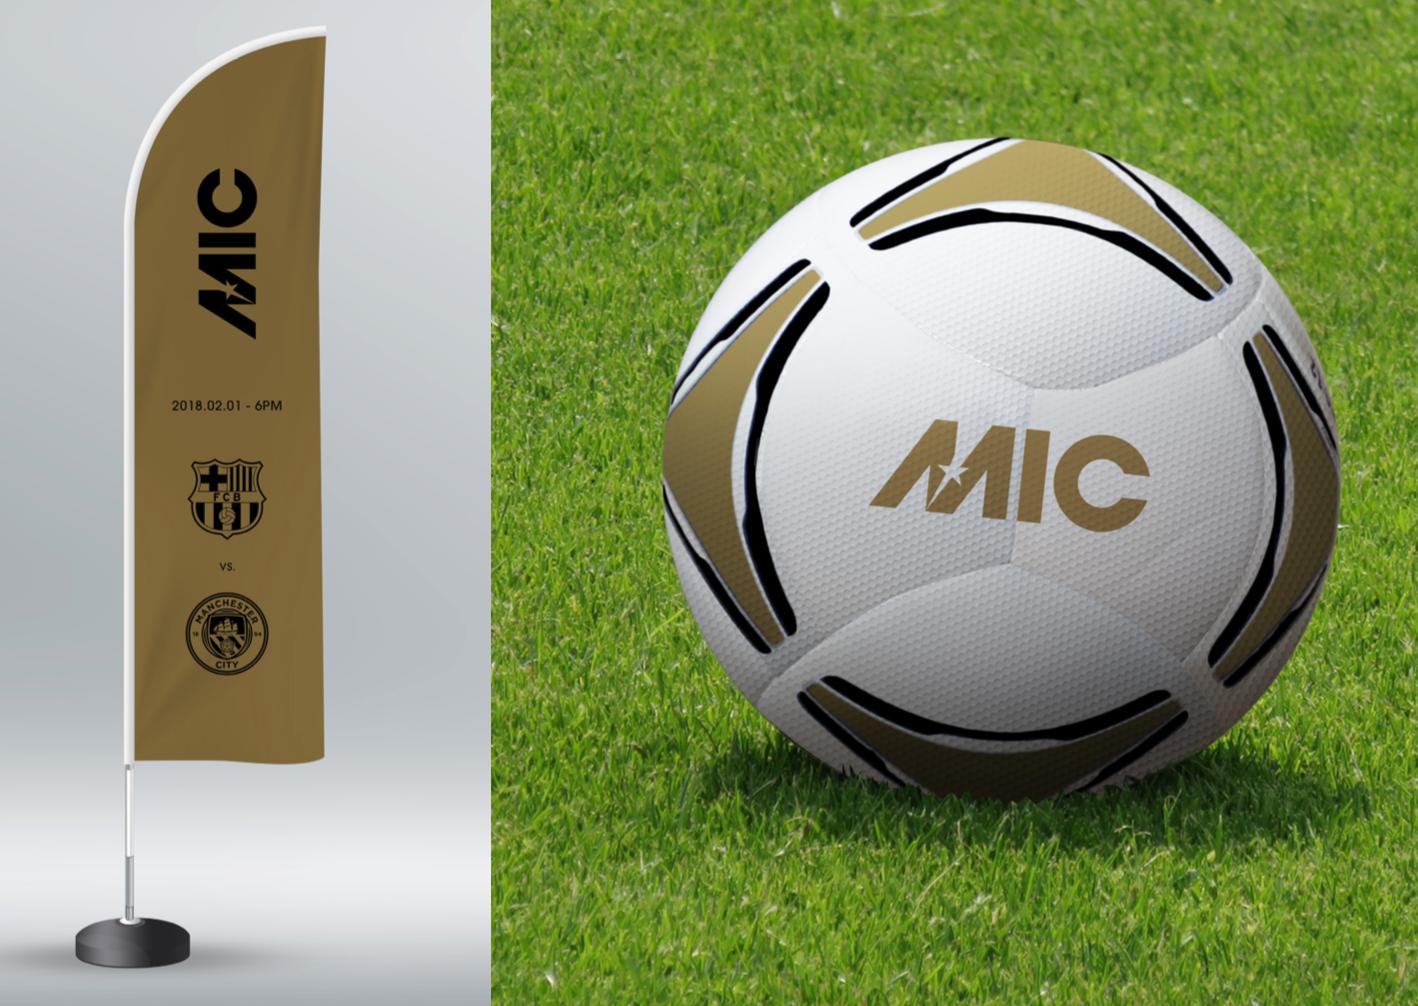 MIC Football USA Brand application